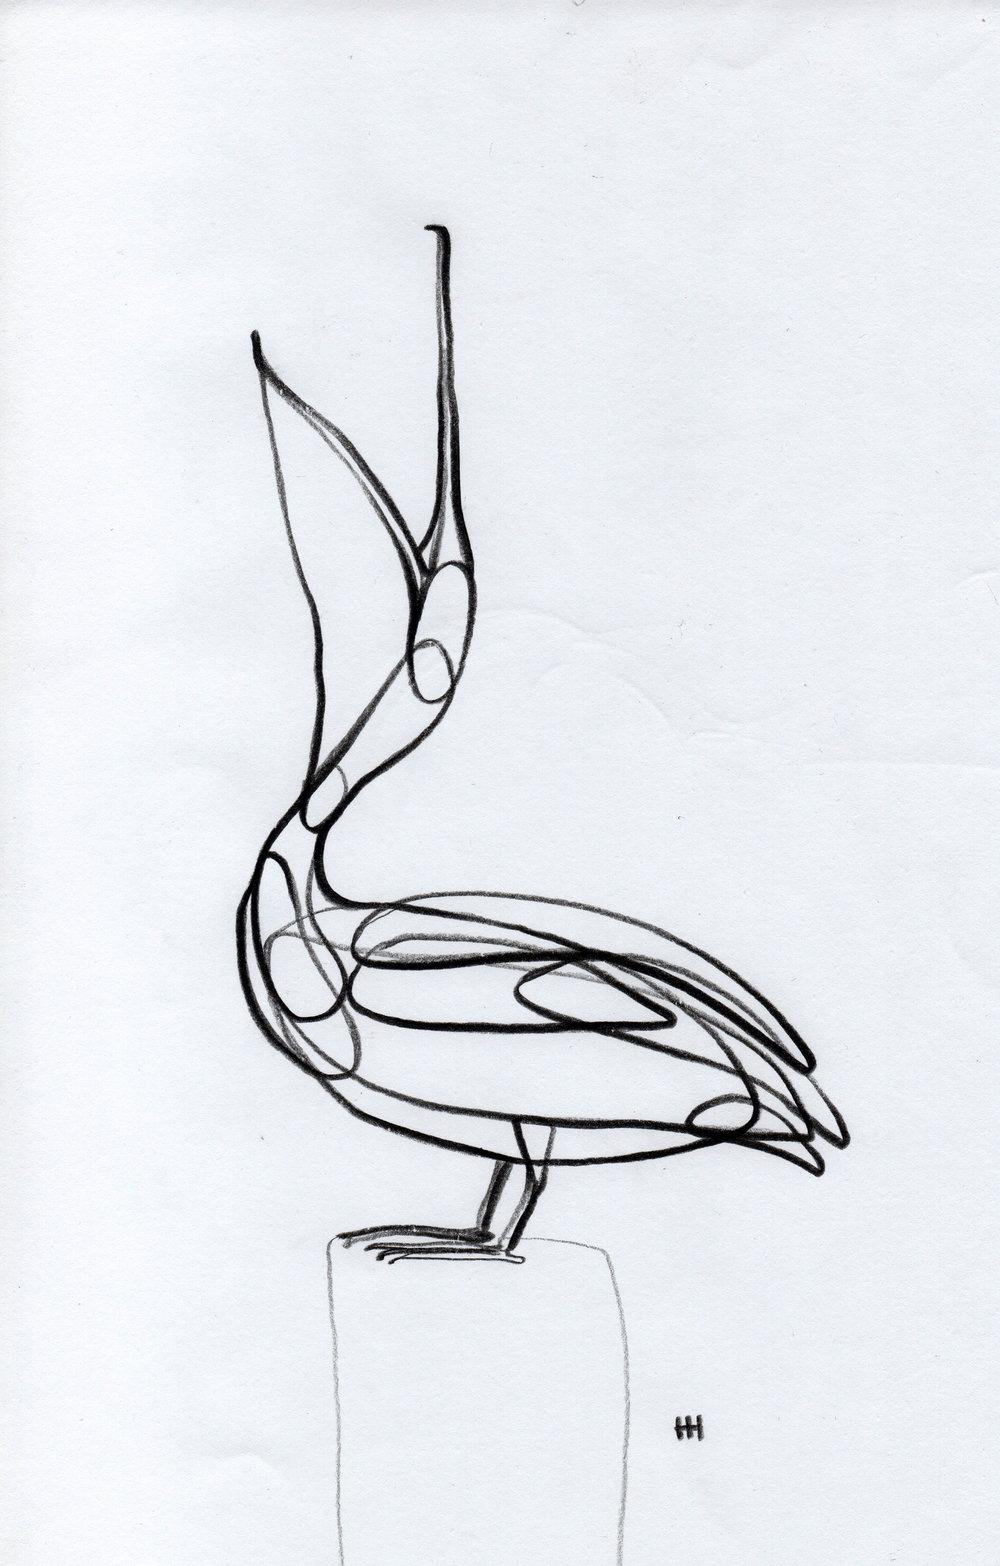 PticyLinejnye_0 11.jpg